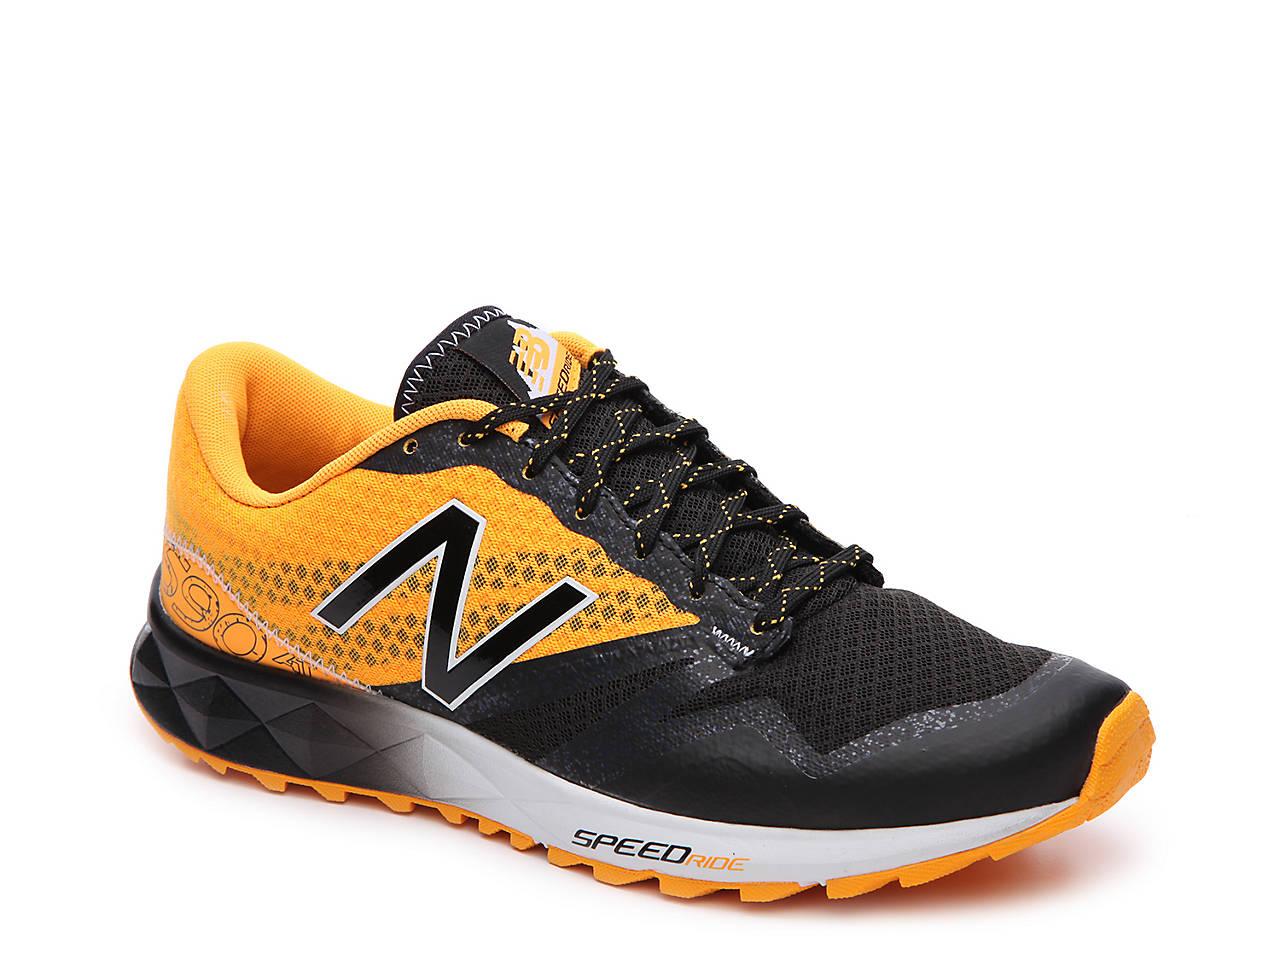 New Balance 690 Especial